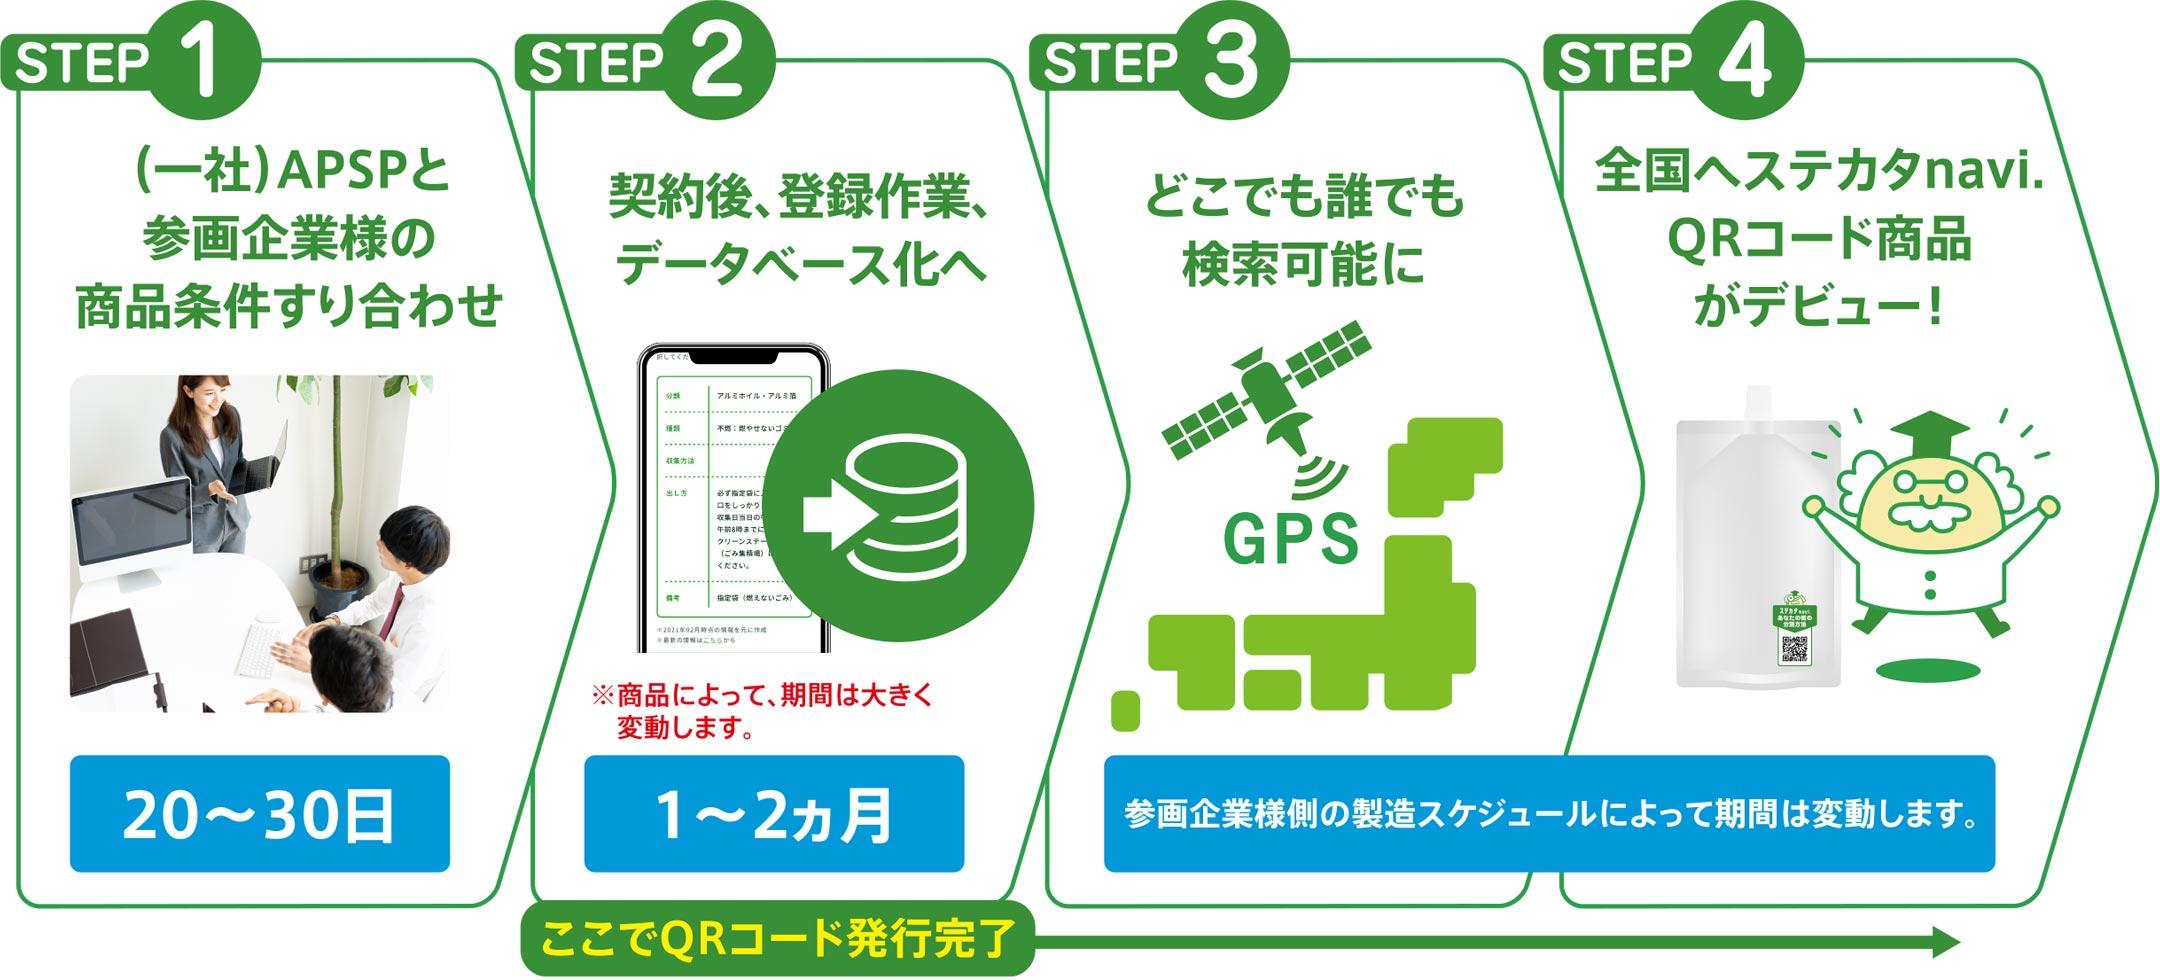 STEP1.(一社)APSPと参画企業様の商品条件すり合わせ → STEP2.契約後、登録作業、データべース化へ → STEP3.どこでも誰でも検索可能に → STEP4.全国へ緑のQRコード商品がデビュー!